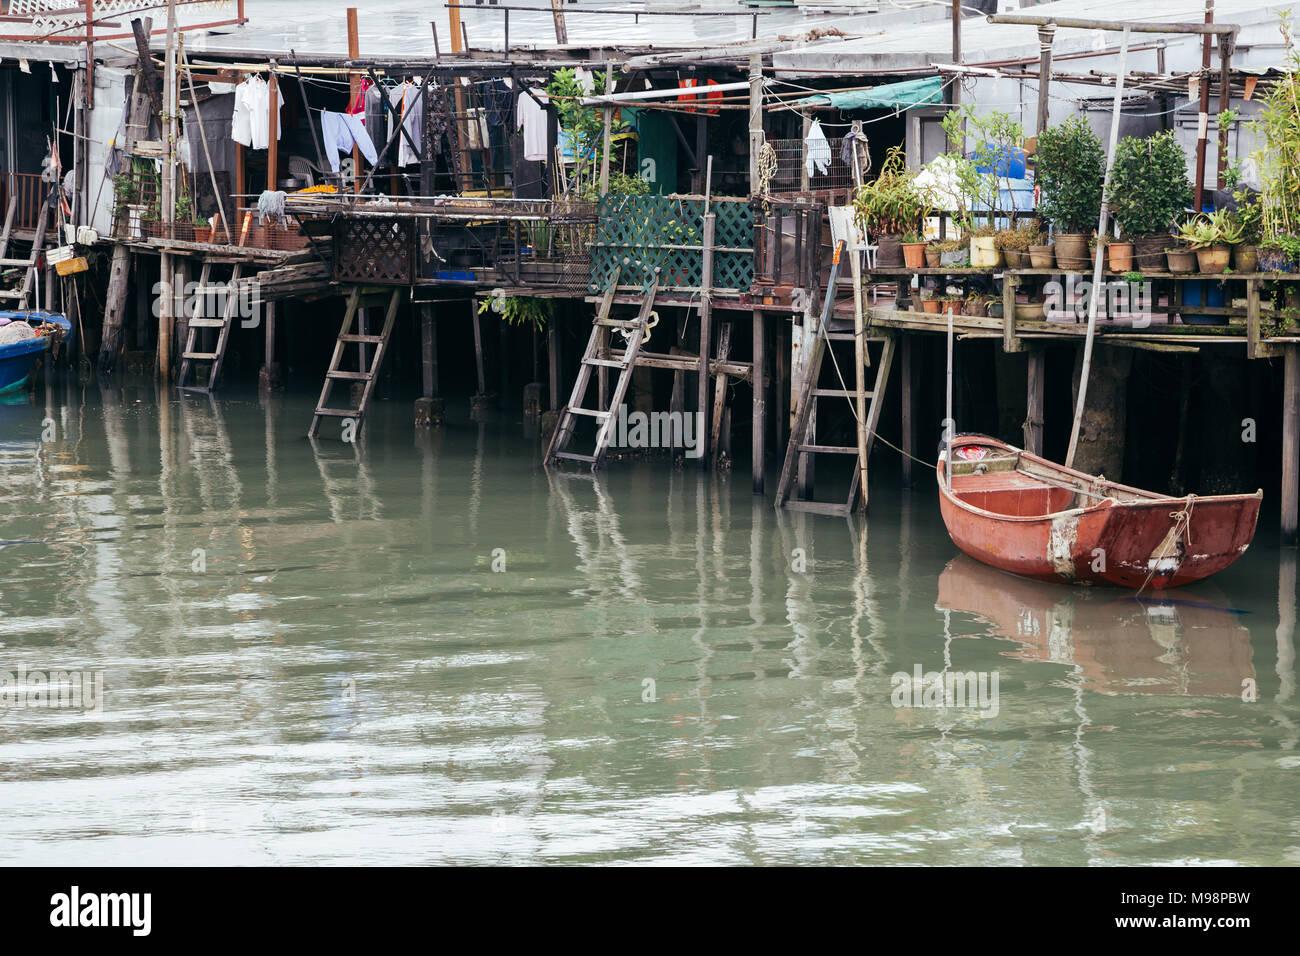 Tai o fishing village, Old floating house and sea in HongKong - Stock Image